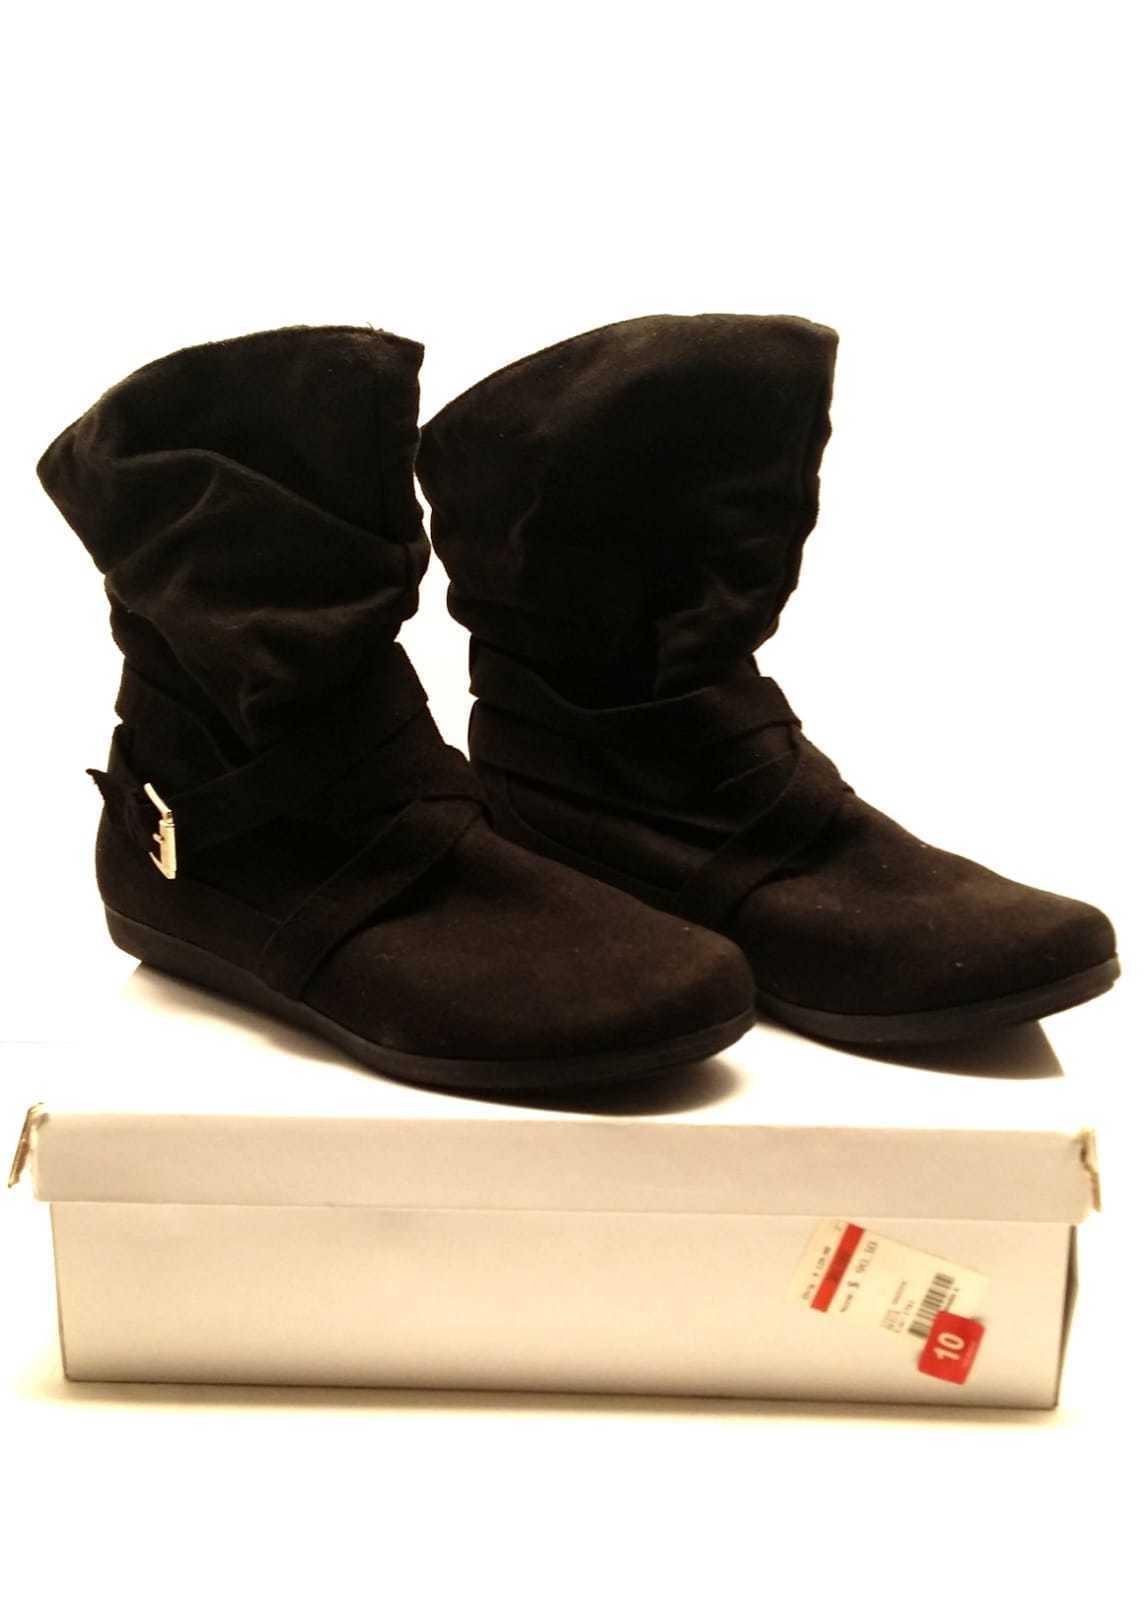 Steve Maddem Neela Boots US 10